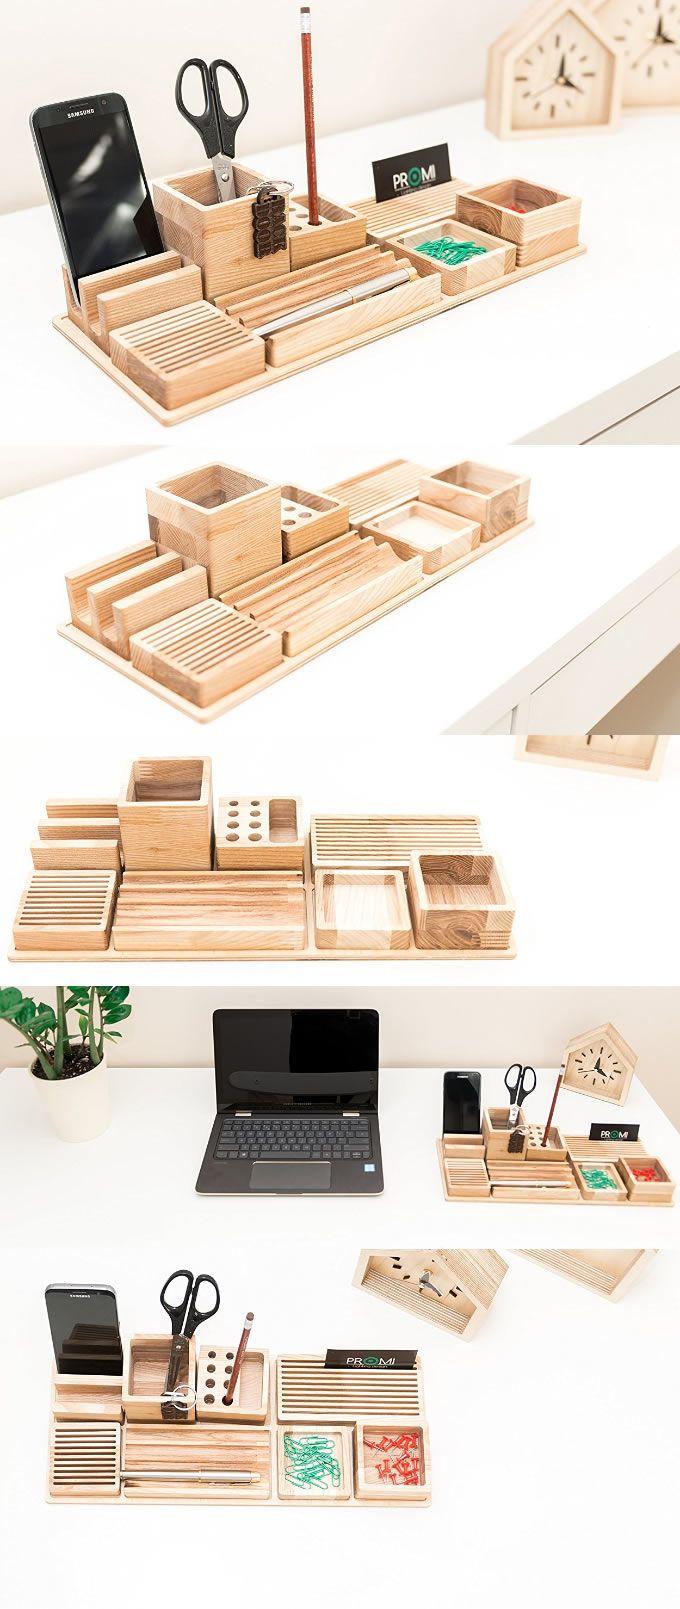 Bamboo Wooden Office Desk Organizer Pen Pencil Holder Stand Smart